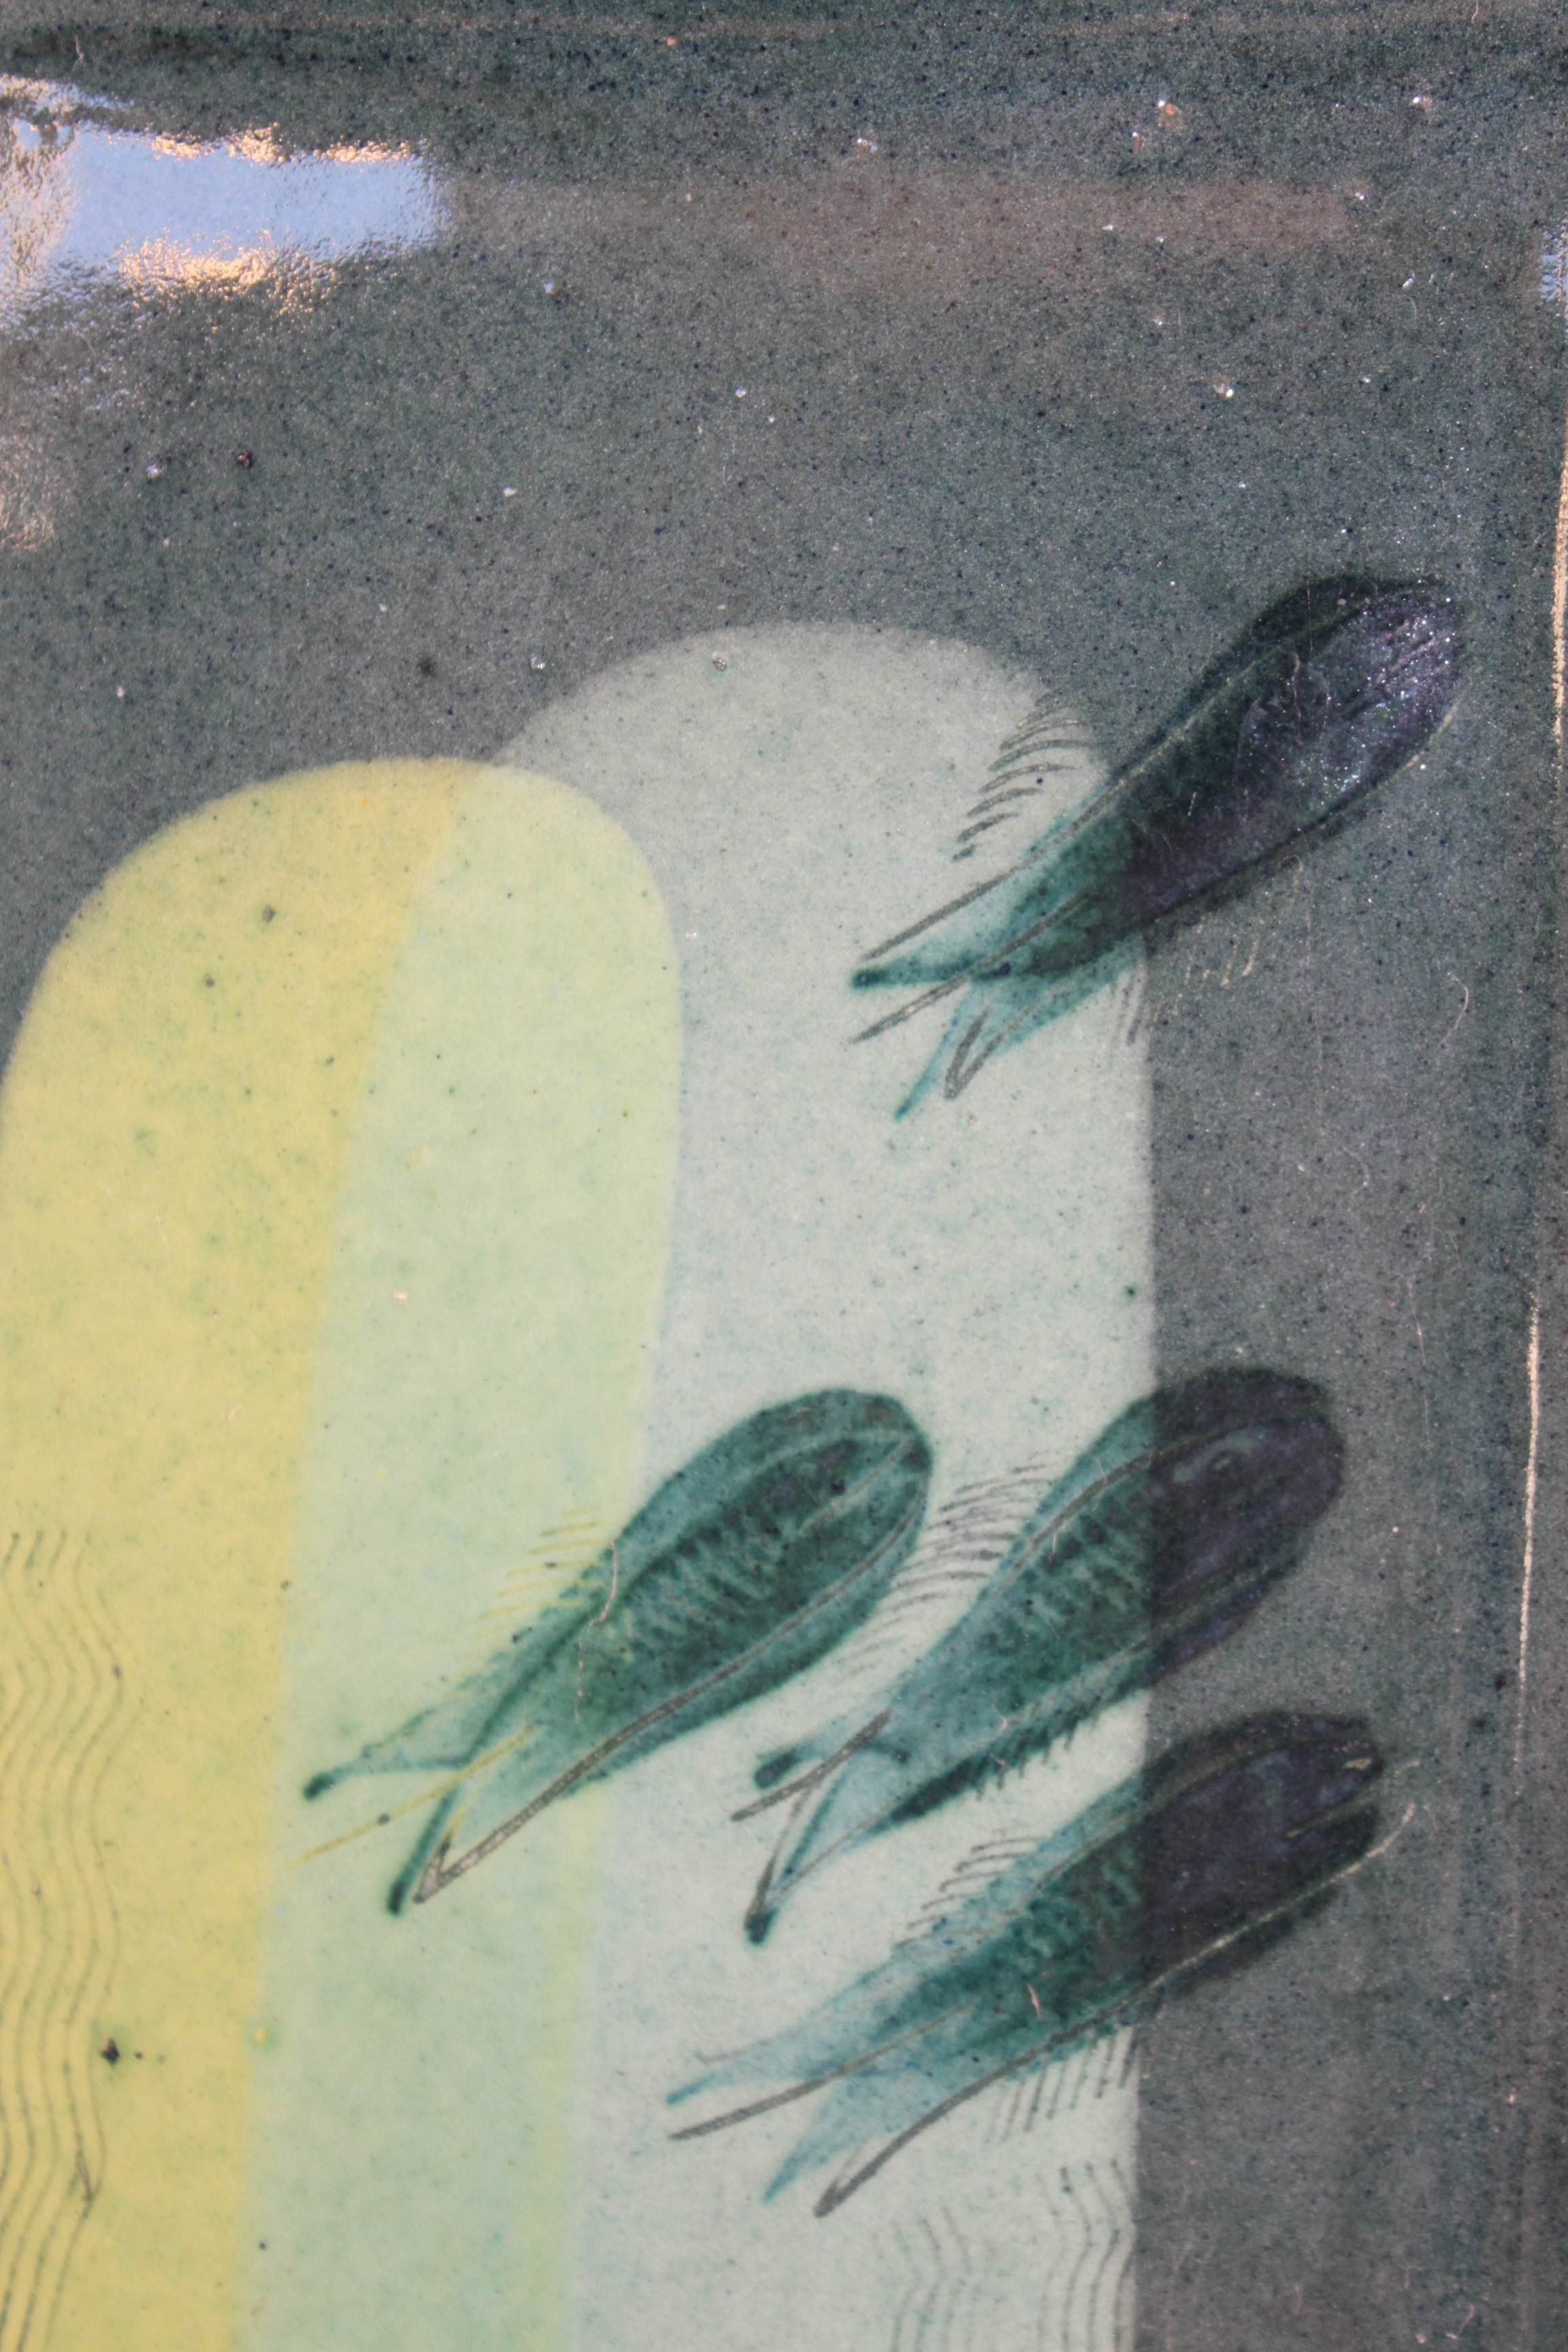 Silberfisch-dunkel-2